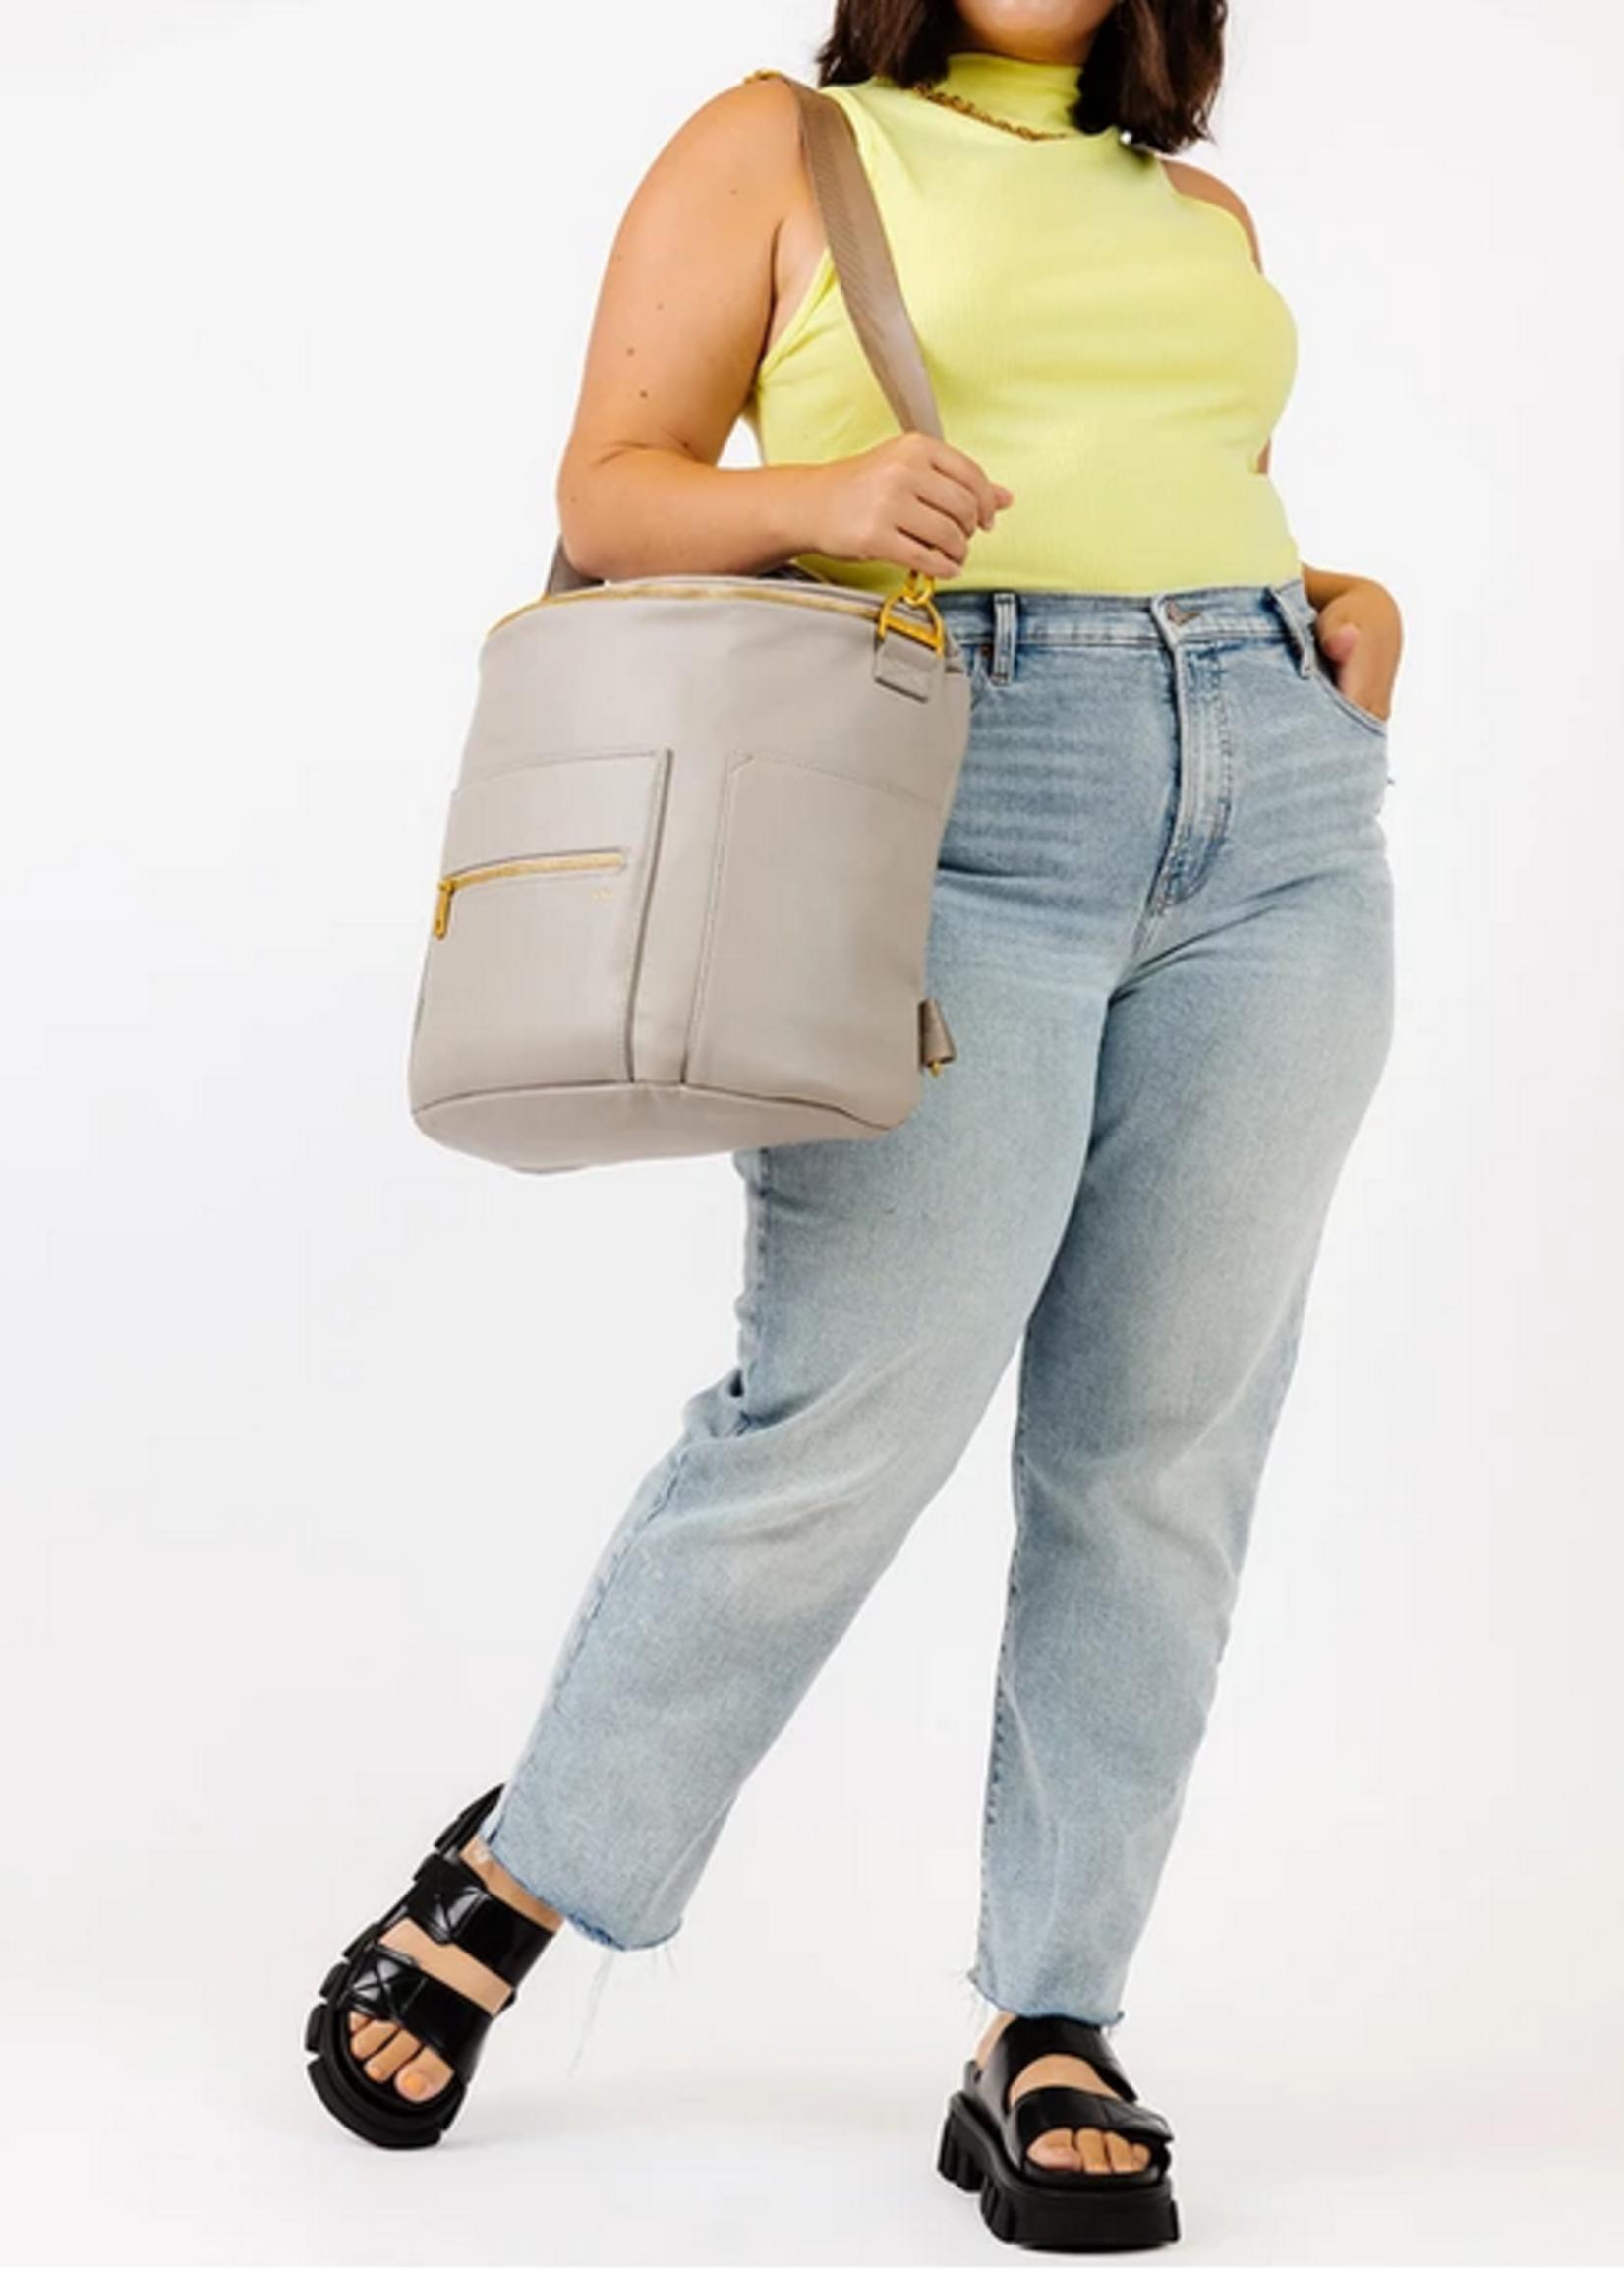 Elitaire Petite The Original Diaper Bag - Grey